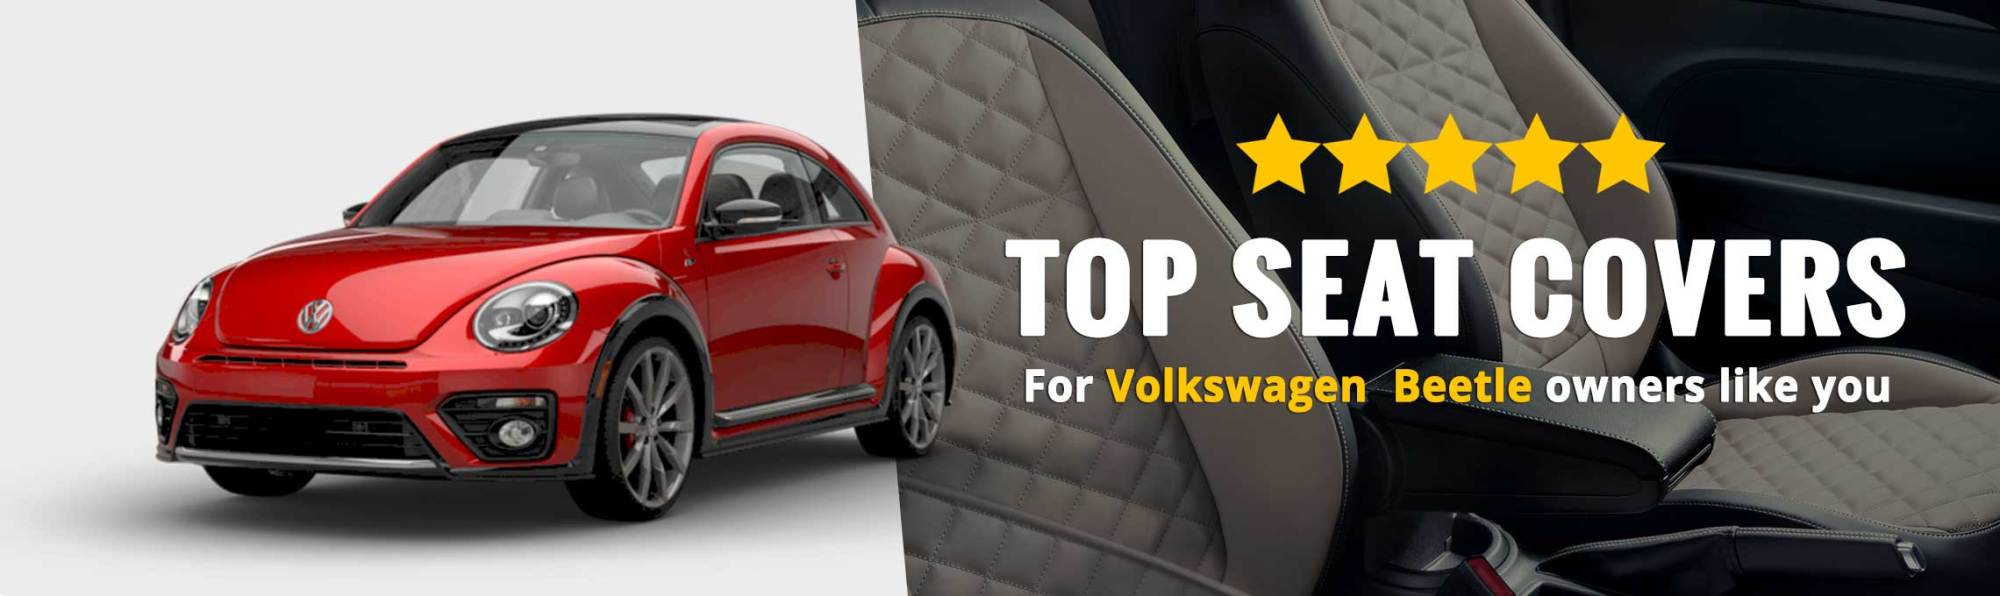 hight resolution of volkswagen beetle seat covers